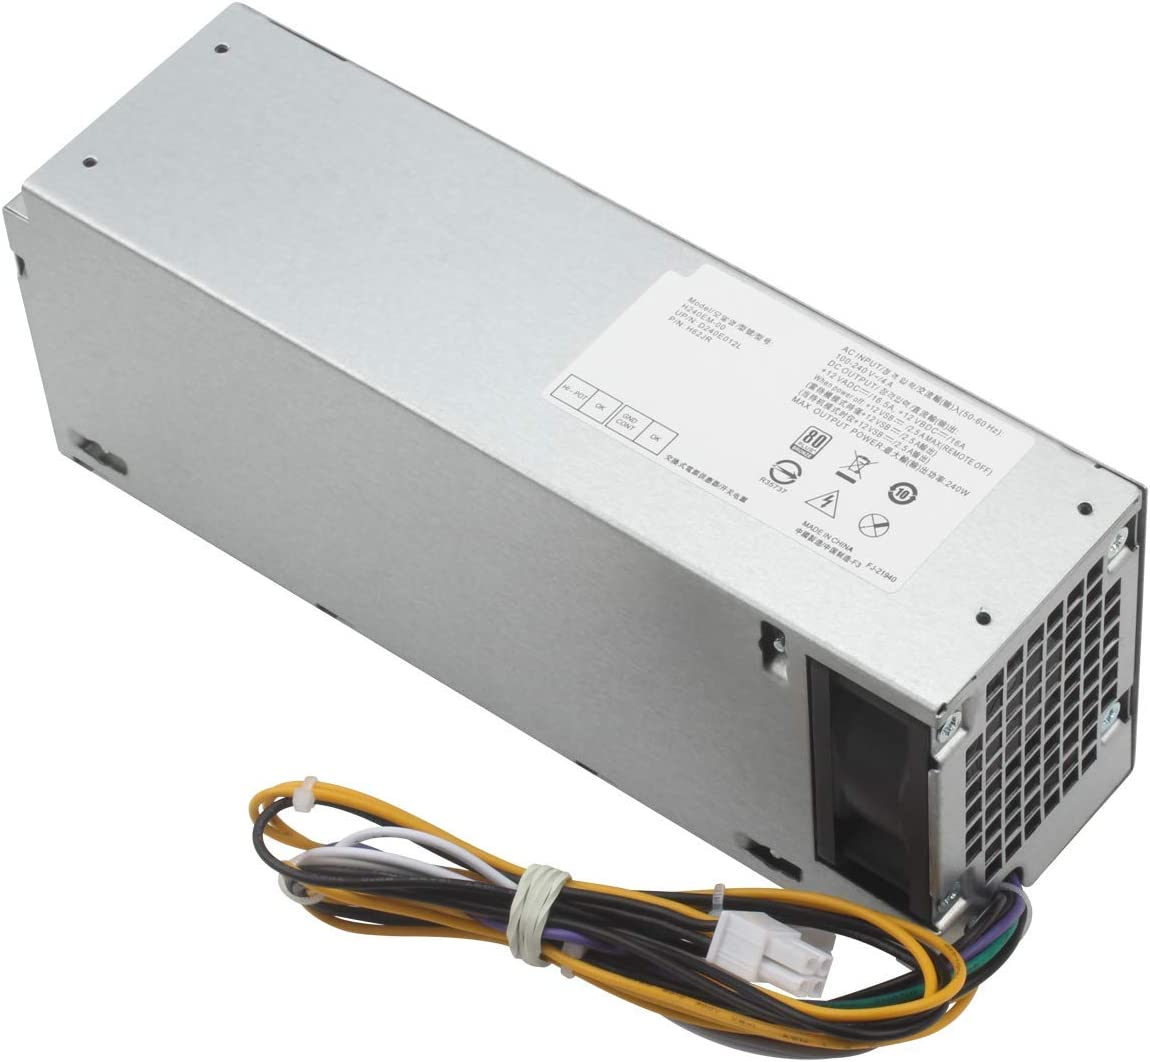 Mackertop L240AM-00 240W Replacement Power Supply for Dell Optiplex 3040 5040 7040 3650 3656 (SFF) H62JR THRJK 4GTN5 D7GX8 HGRMH 2P1RD 3RK5T H240EM-00 B024NM-00 HU240AM-00 AC240EM-00 D240AS-00